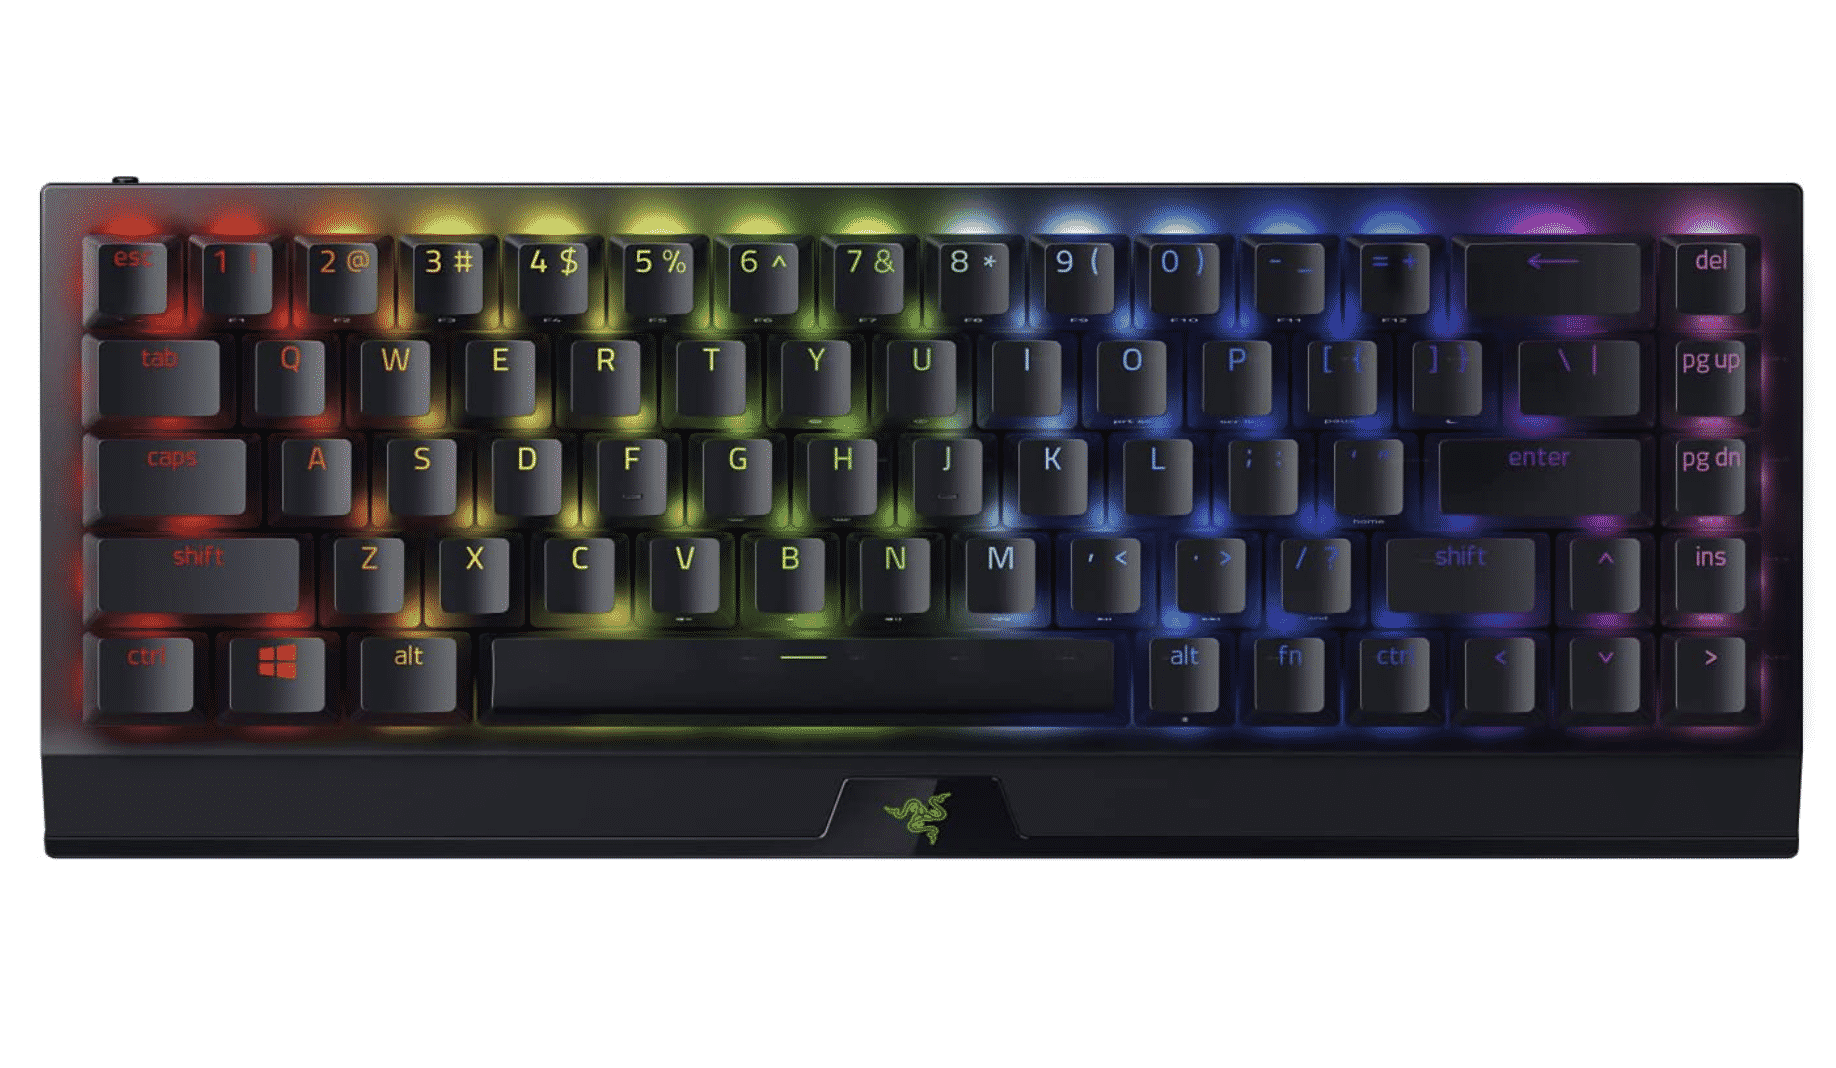 Grab Razer's Mini Mechanical Gaming Wireless Keyboard